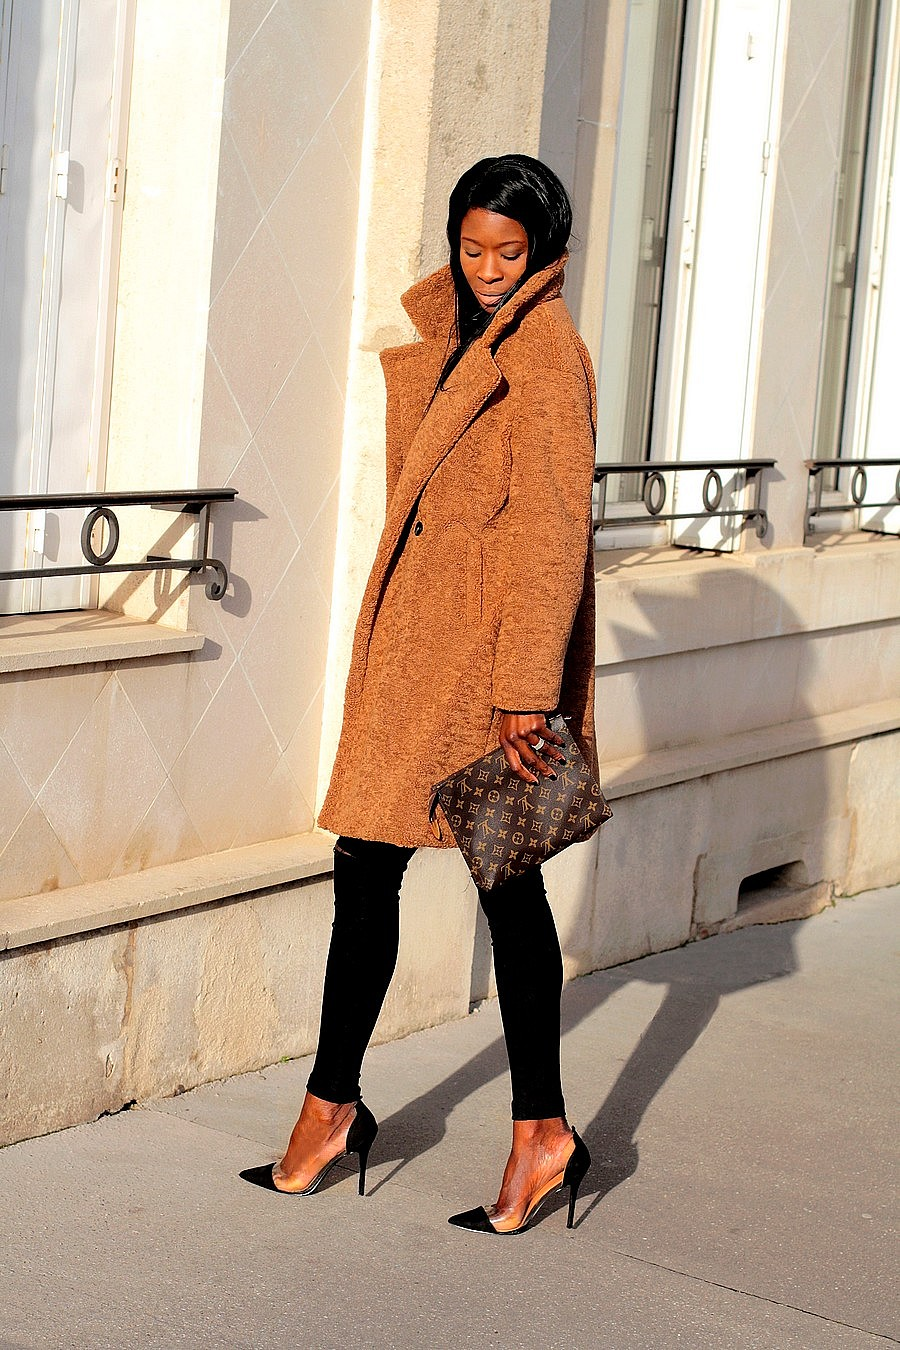 poche-toilette-louis-vuitton-26-itbag-perspex-heels-teddy-coat